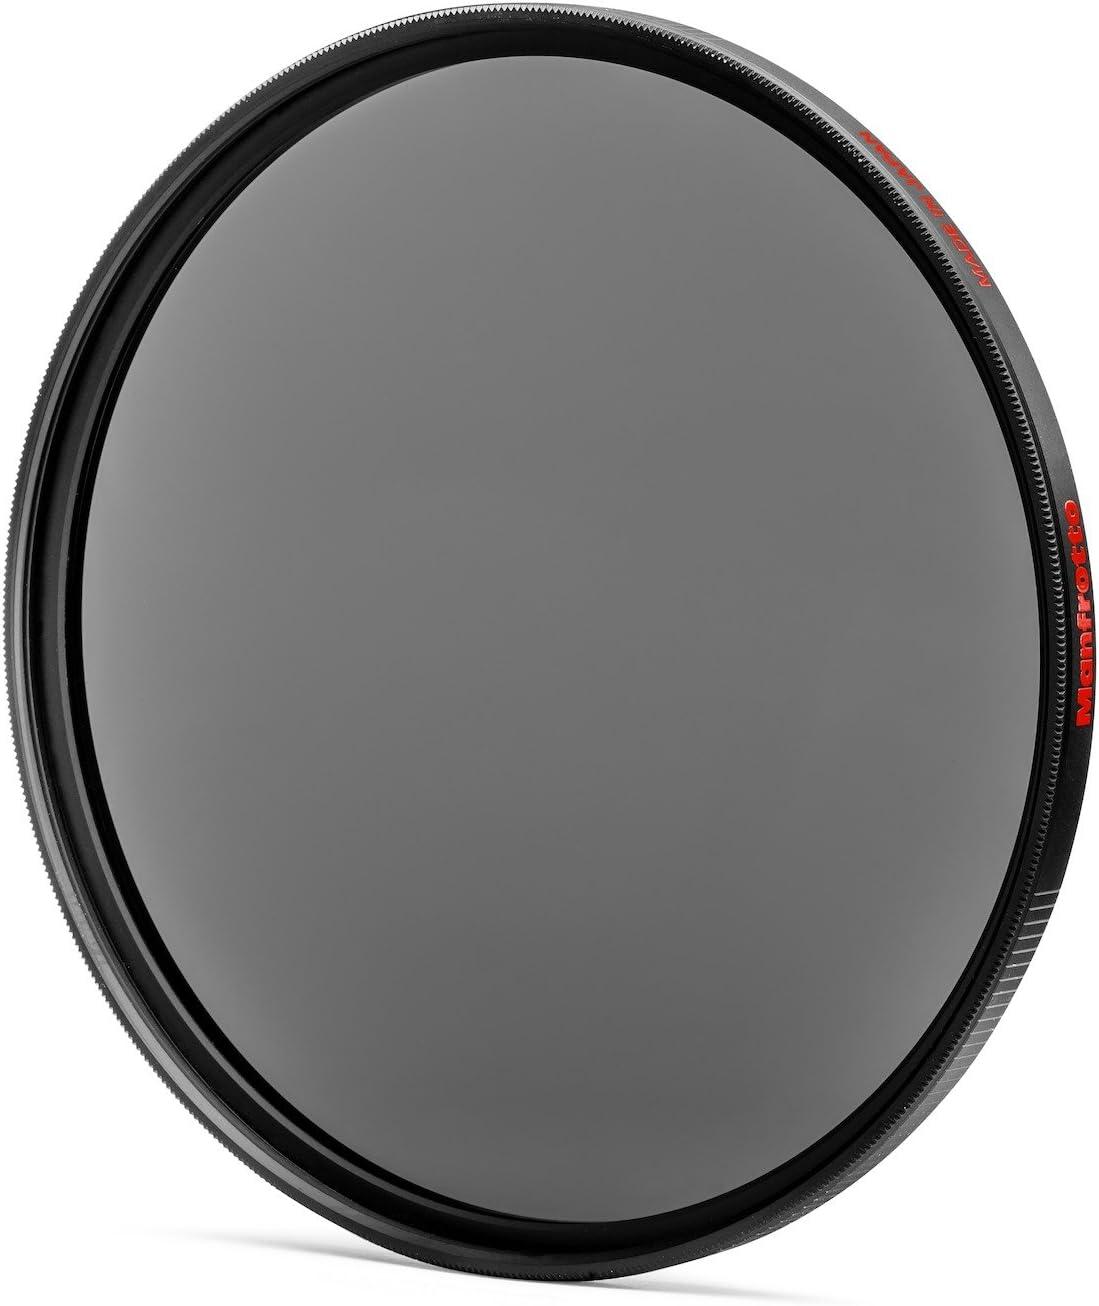 Manfrotto Nd Filter 77 Mm Kamera